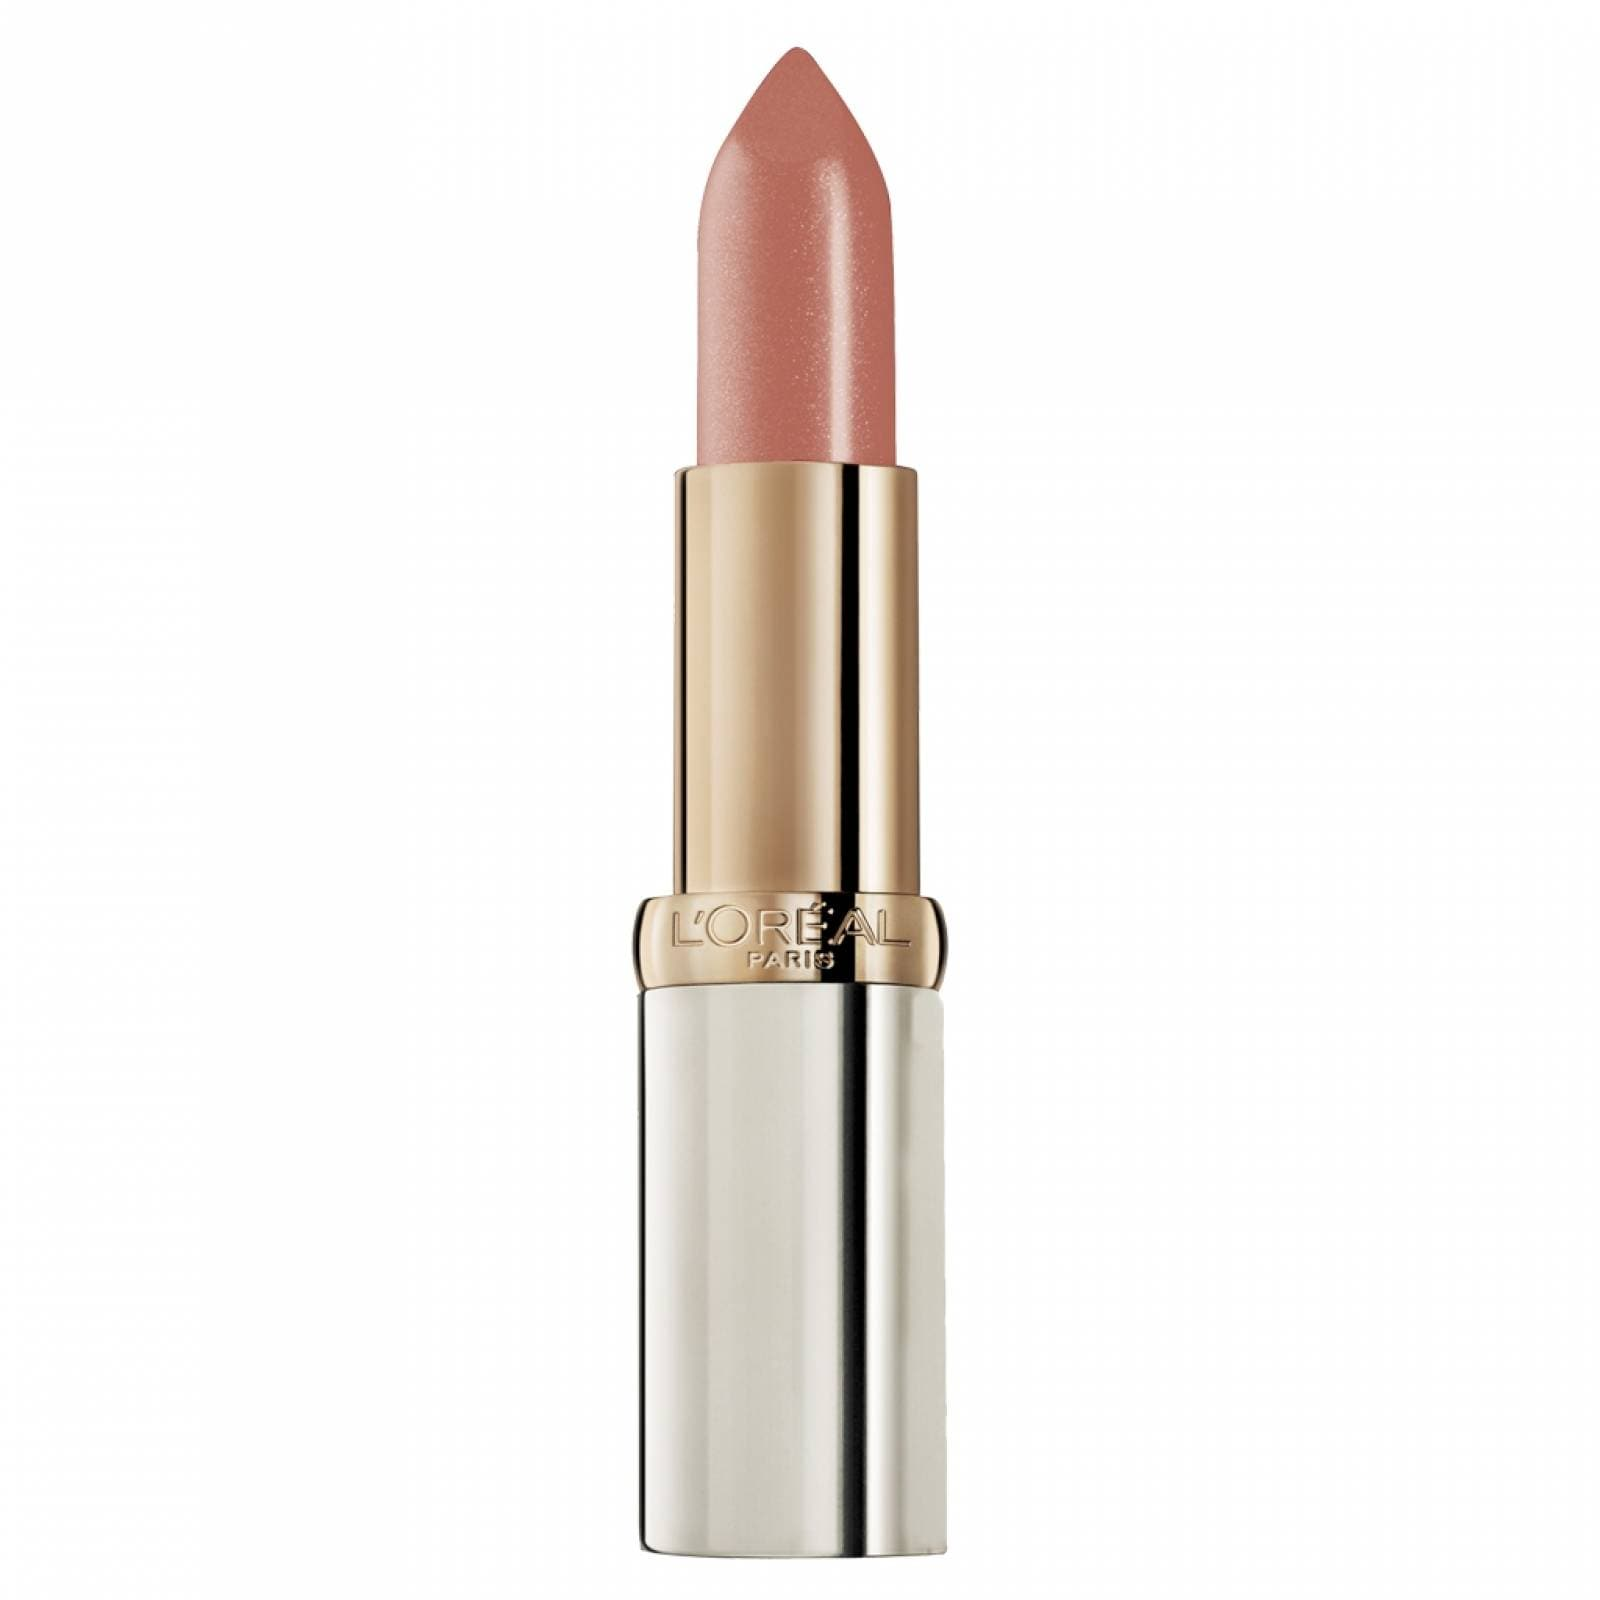 Kit Maquillaje Shell Beige + labiall Boreal233 L'Oréal Paris